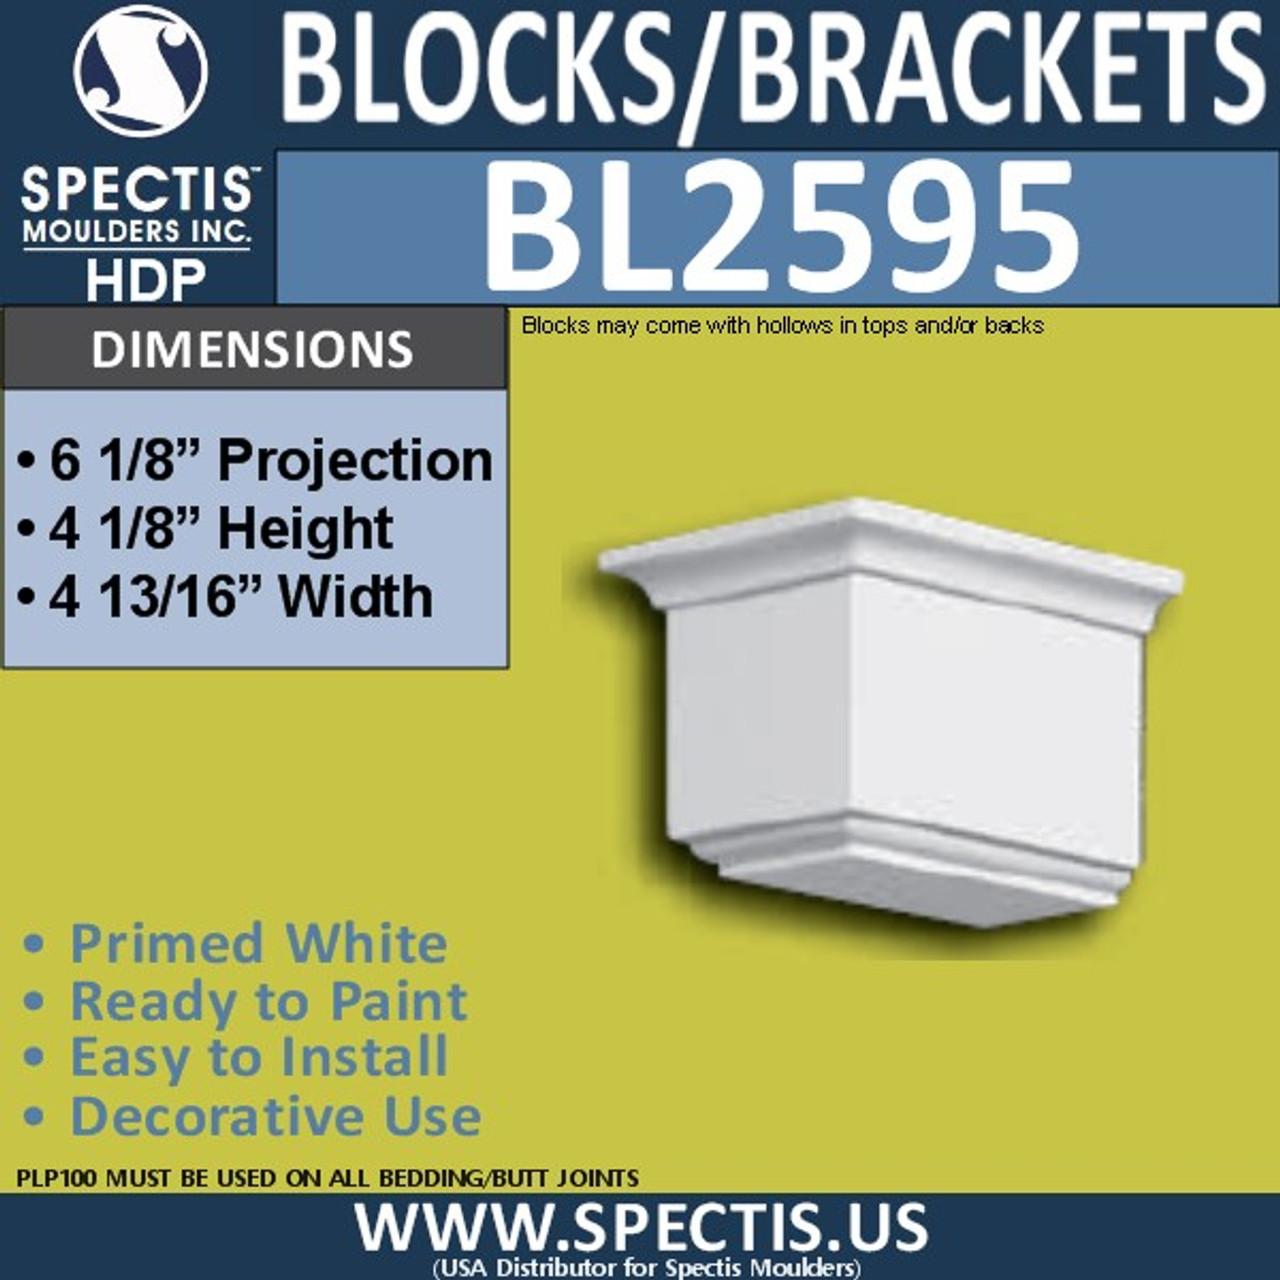 "BL2595 Eave Block or Bracket 4.75""W x 4.12""H x 6.2"" P"